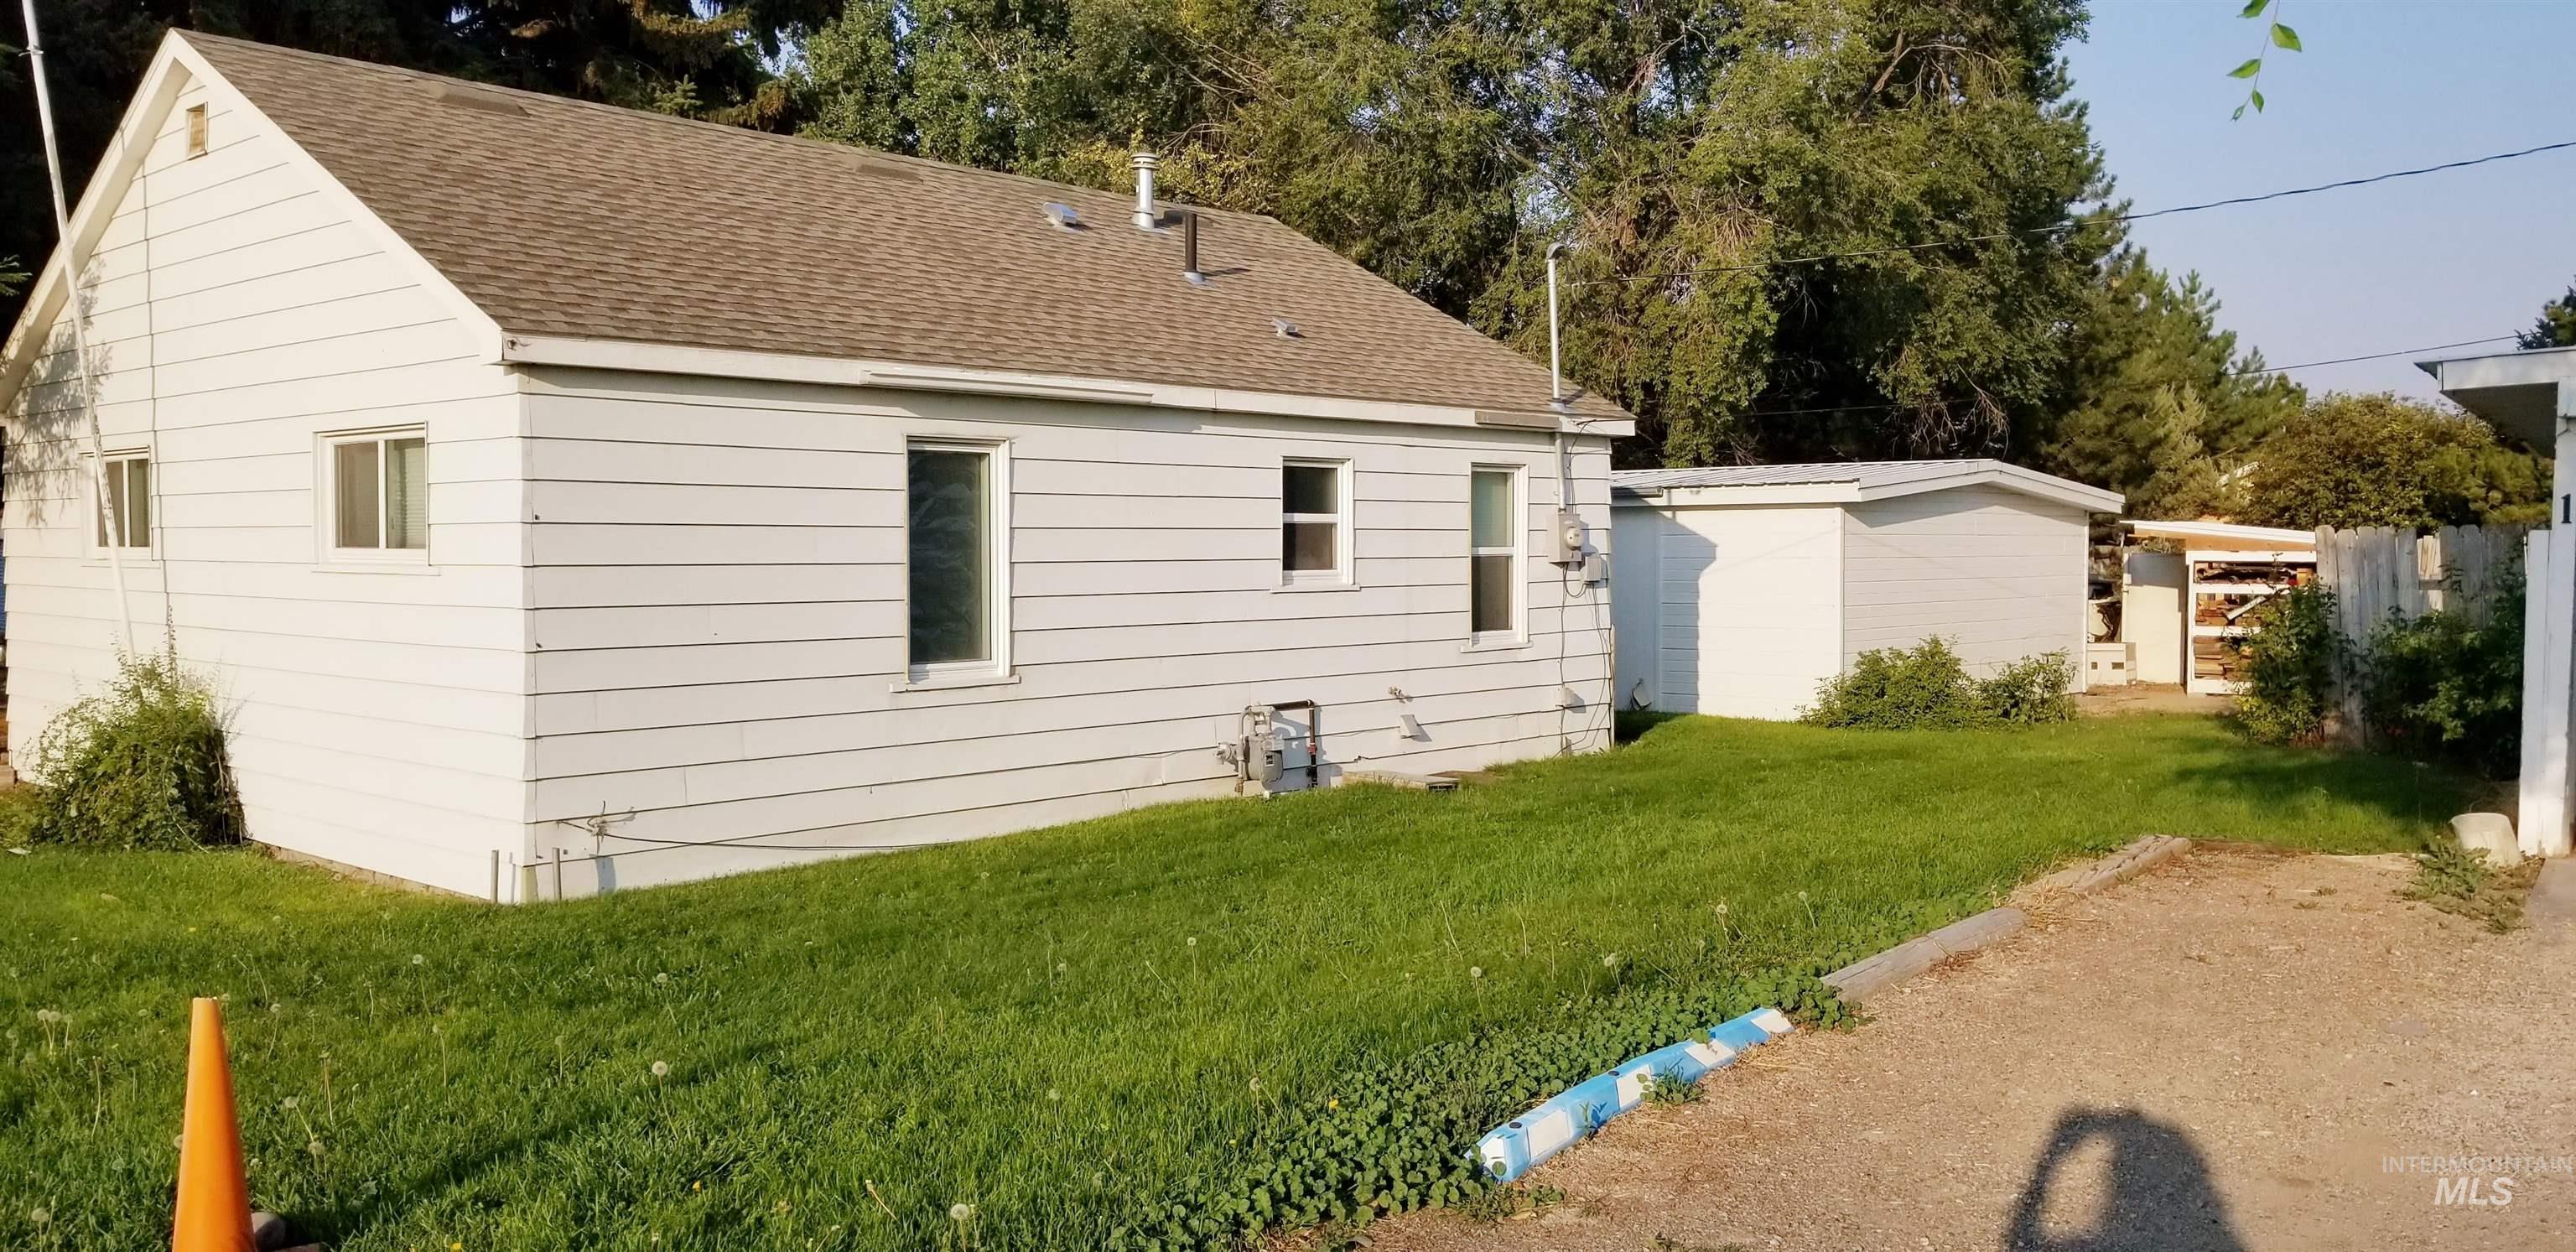 152 Hwy 30 1-7 Property Photo